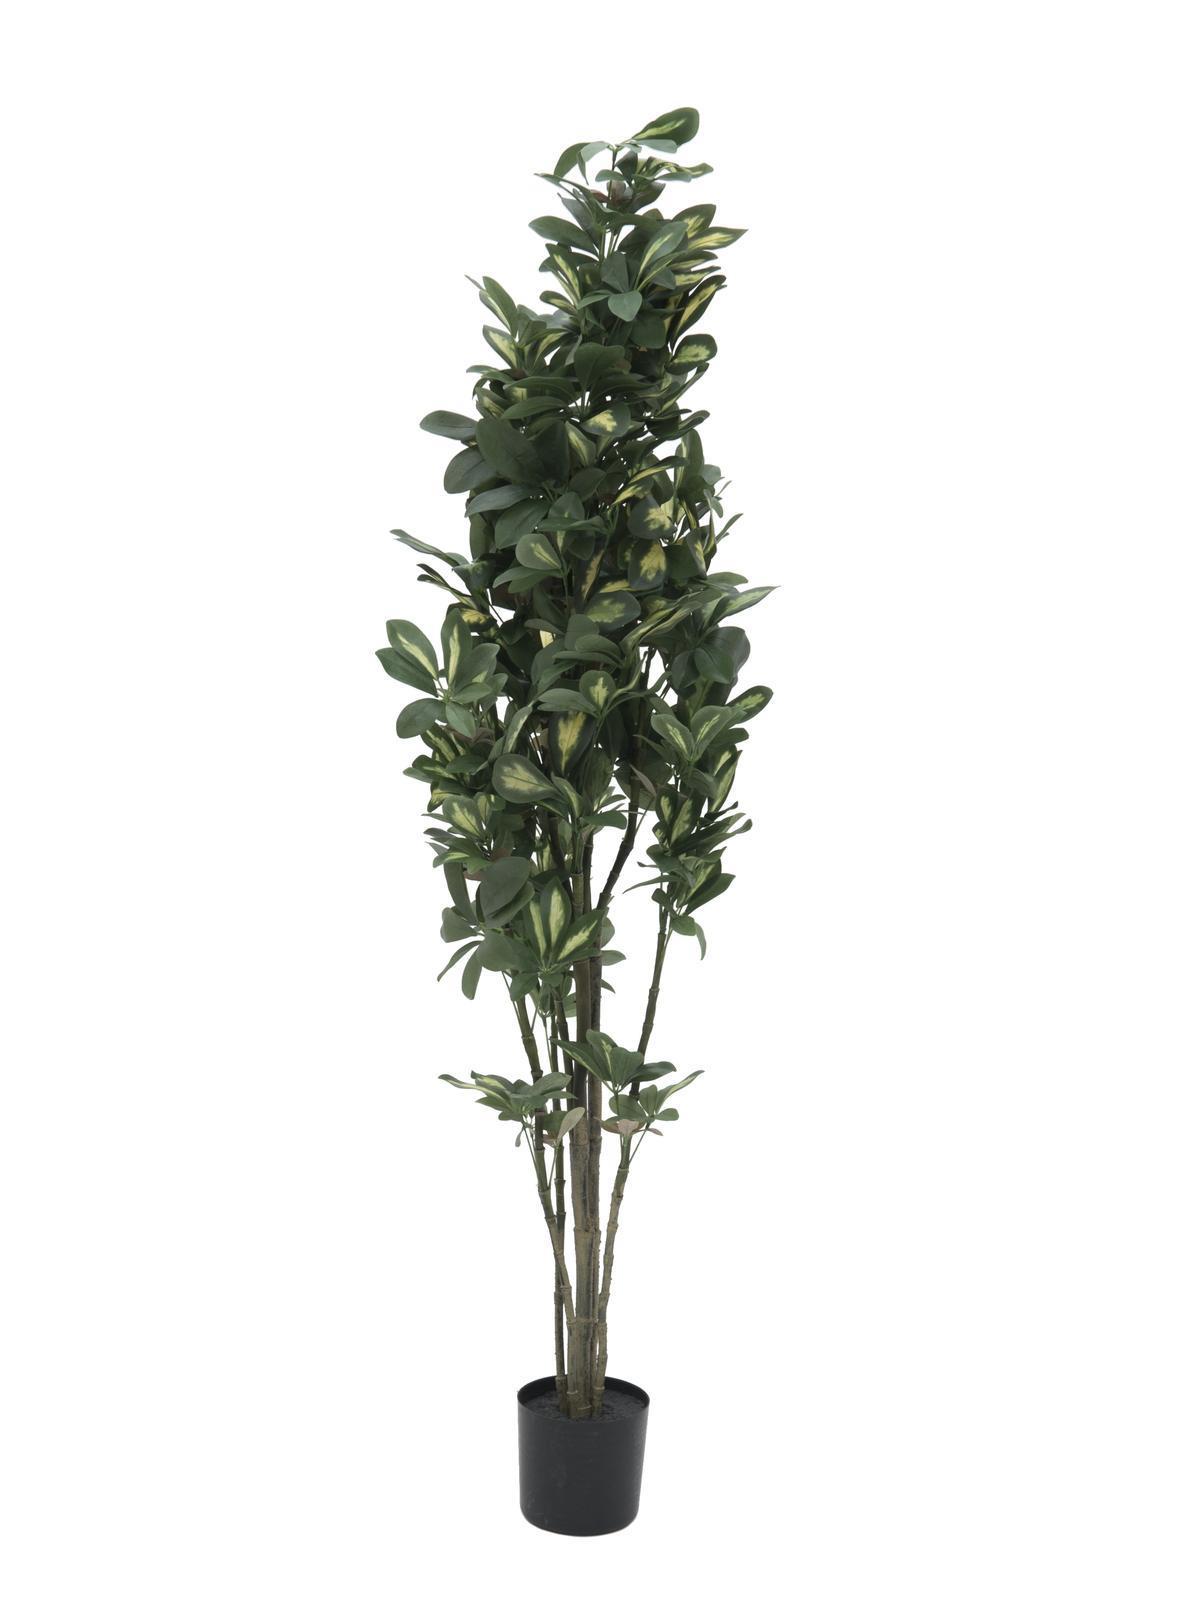 Europalms Schefflera, 120cm - Kunstpflanze